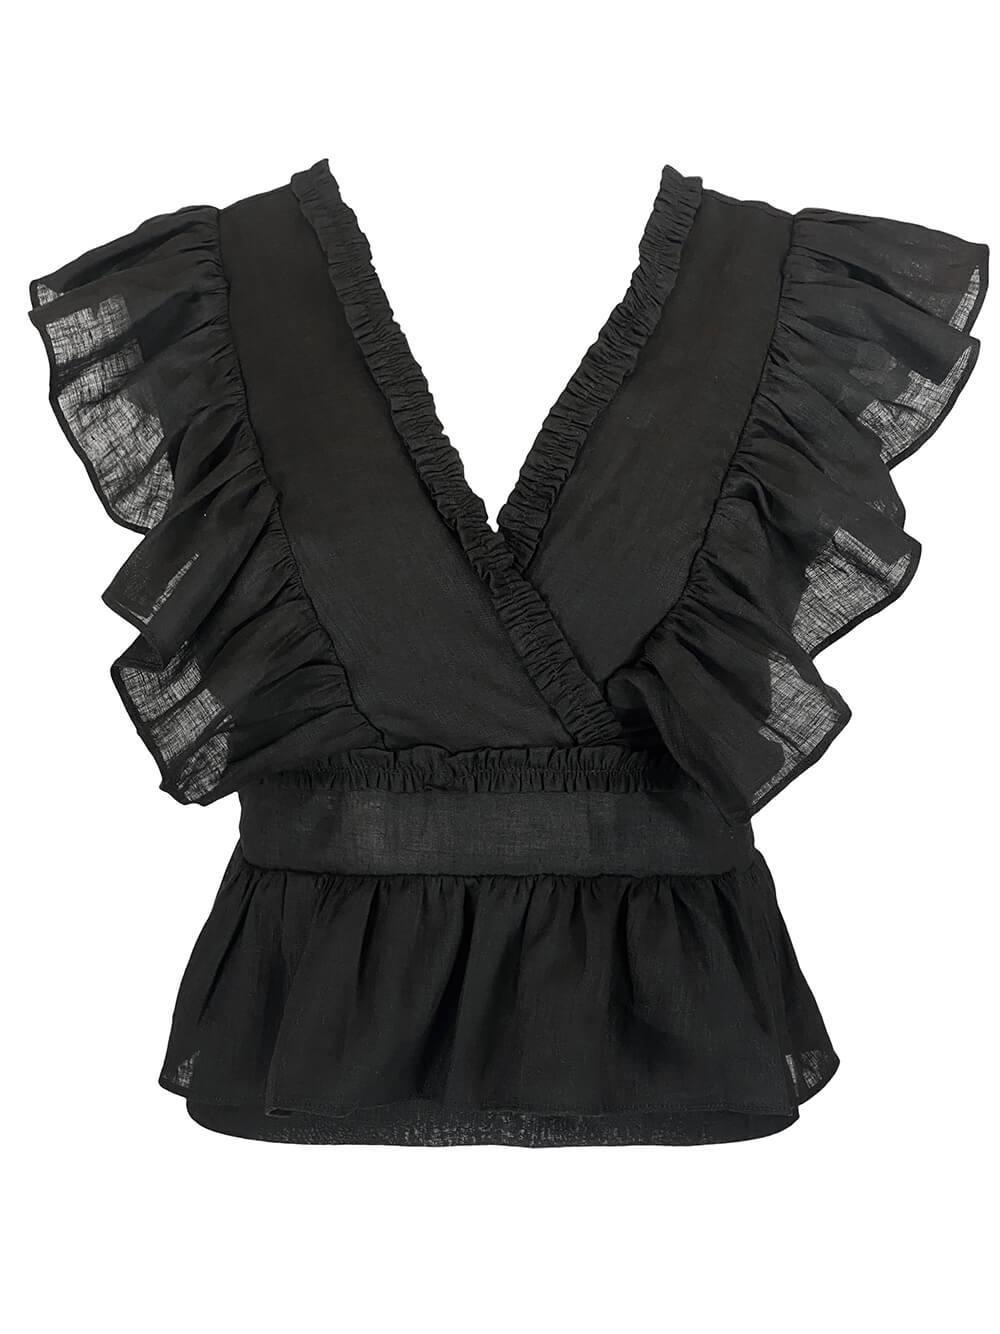 Marina Linen Blouse Item # CLB57-C